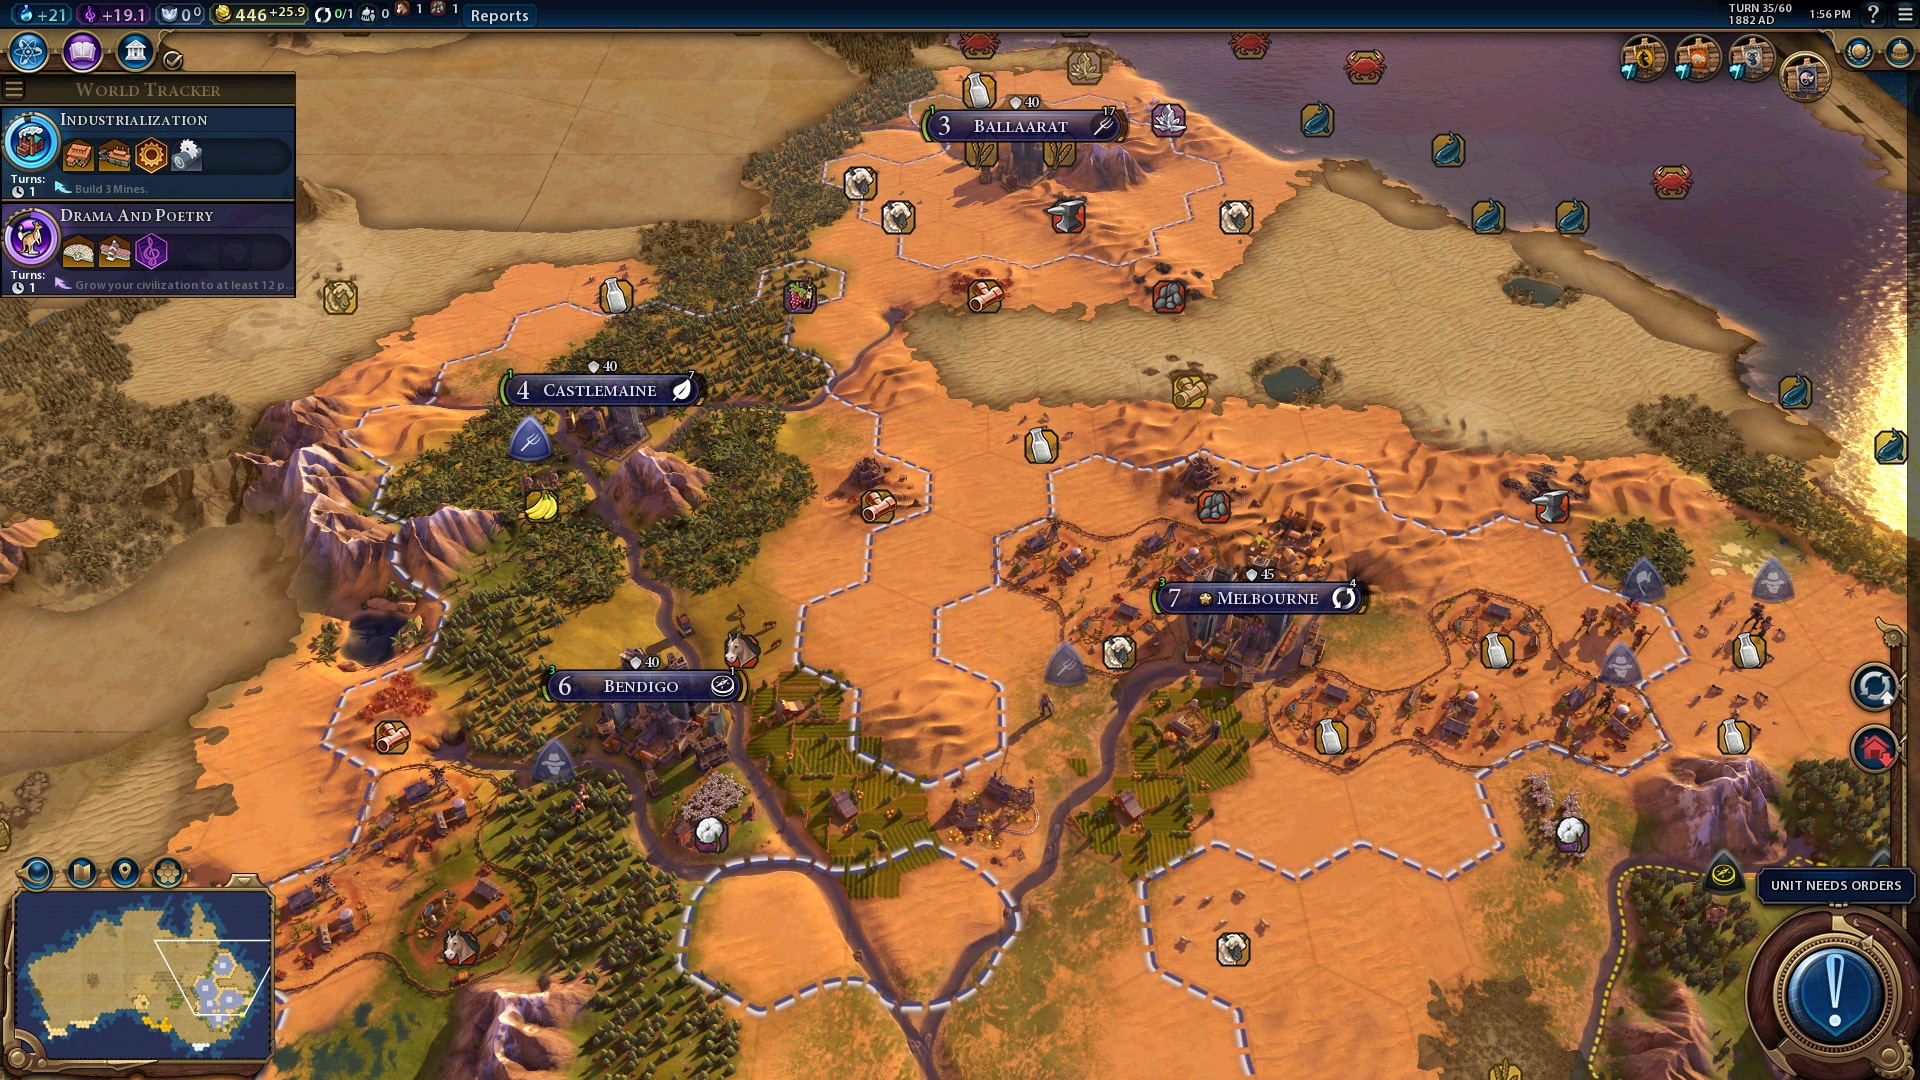 Sid Meier's Civilization VI - Australia Civilization & Scenario Pack (PC) - Steam Key - GLOBAL - 4